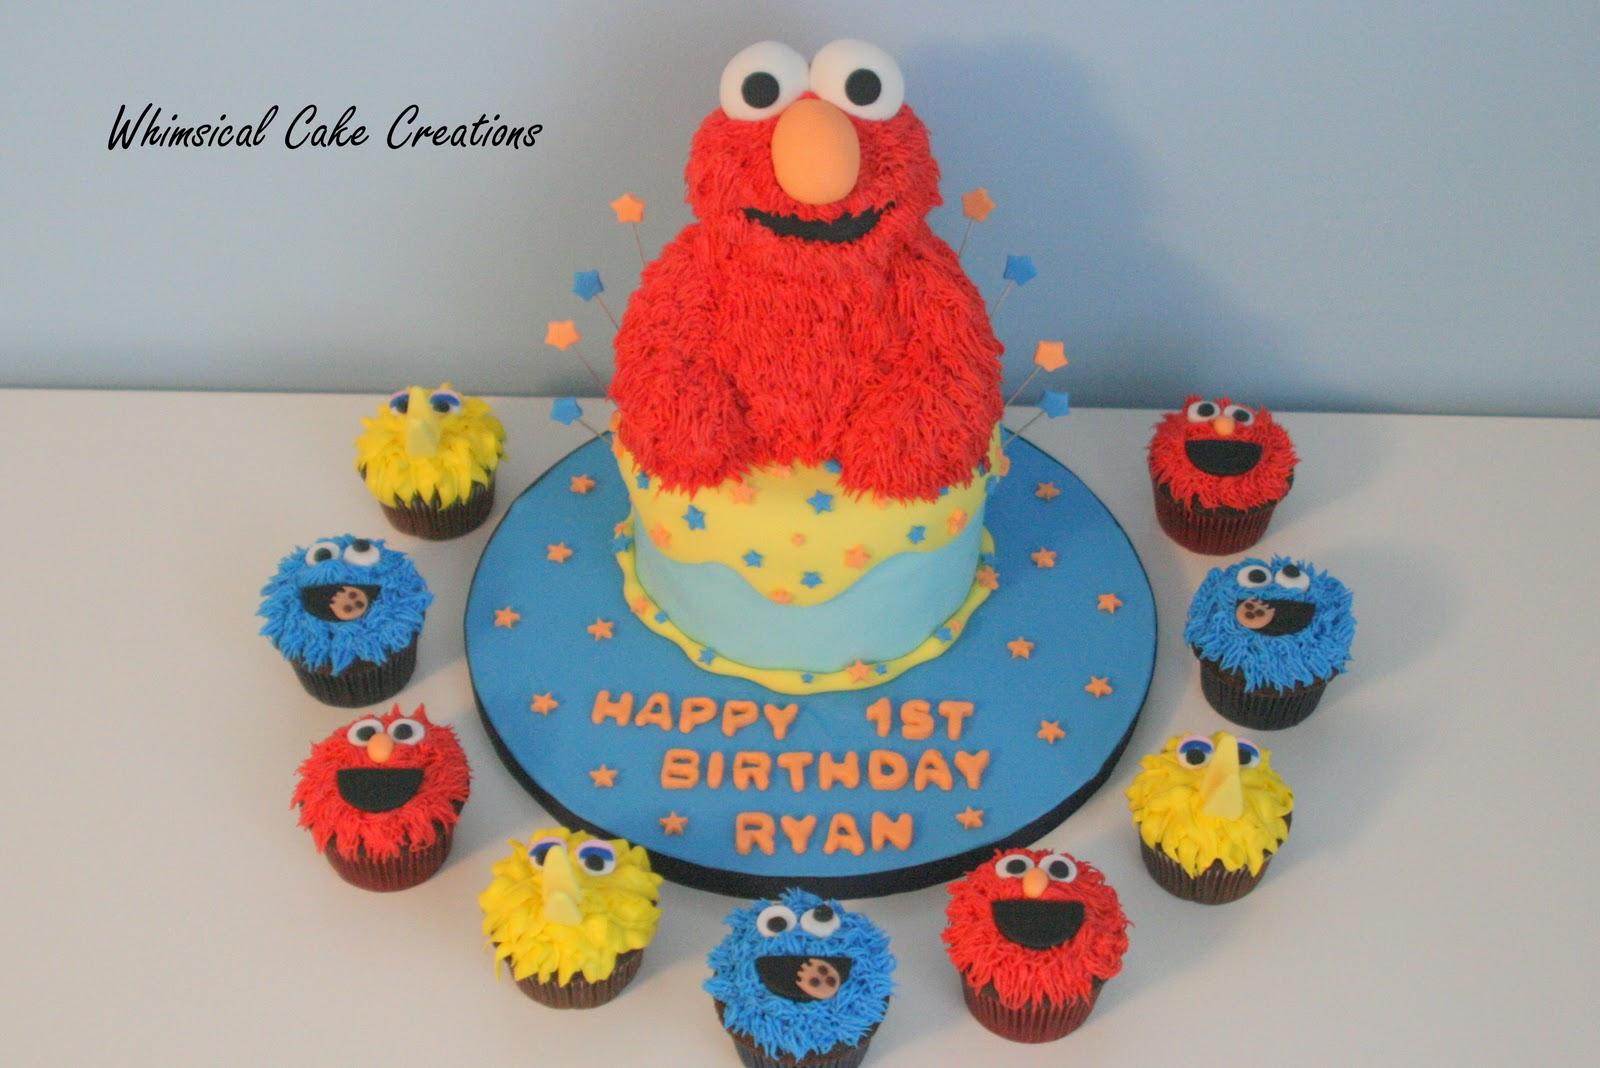 Whimsicalcreations Ca Sesame Street Cake With Elmo Big